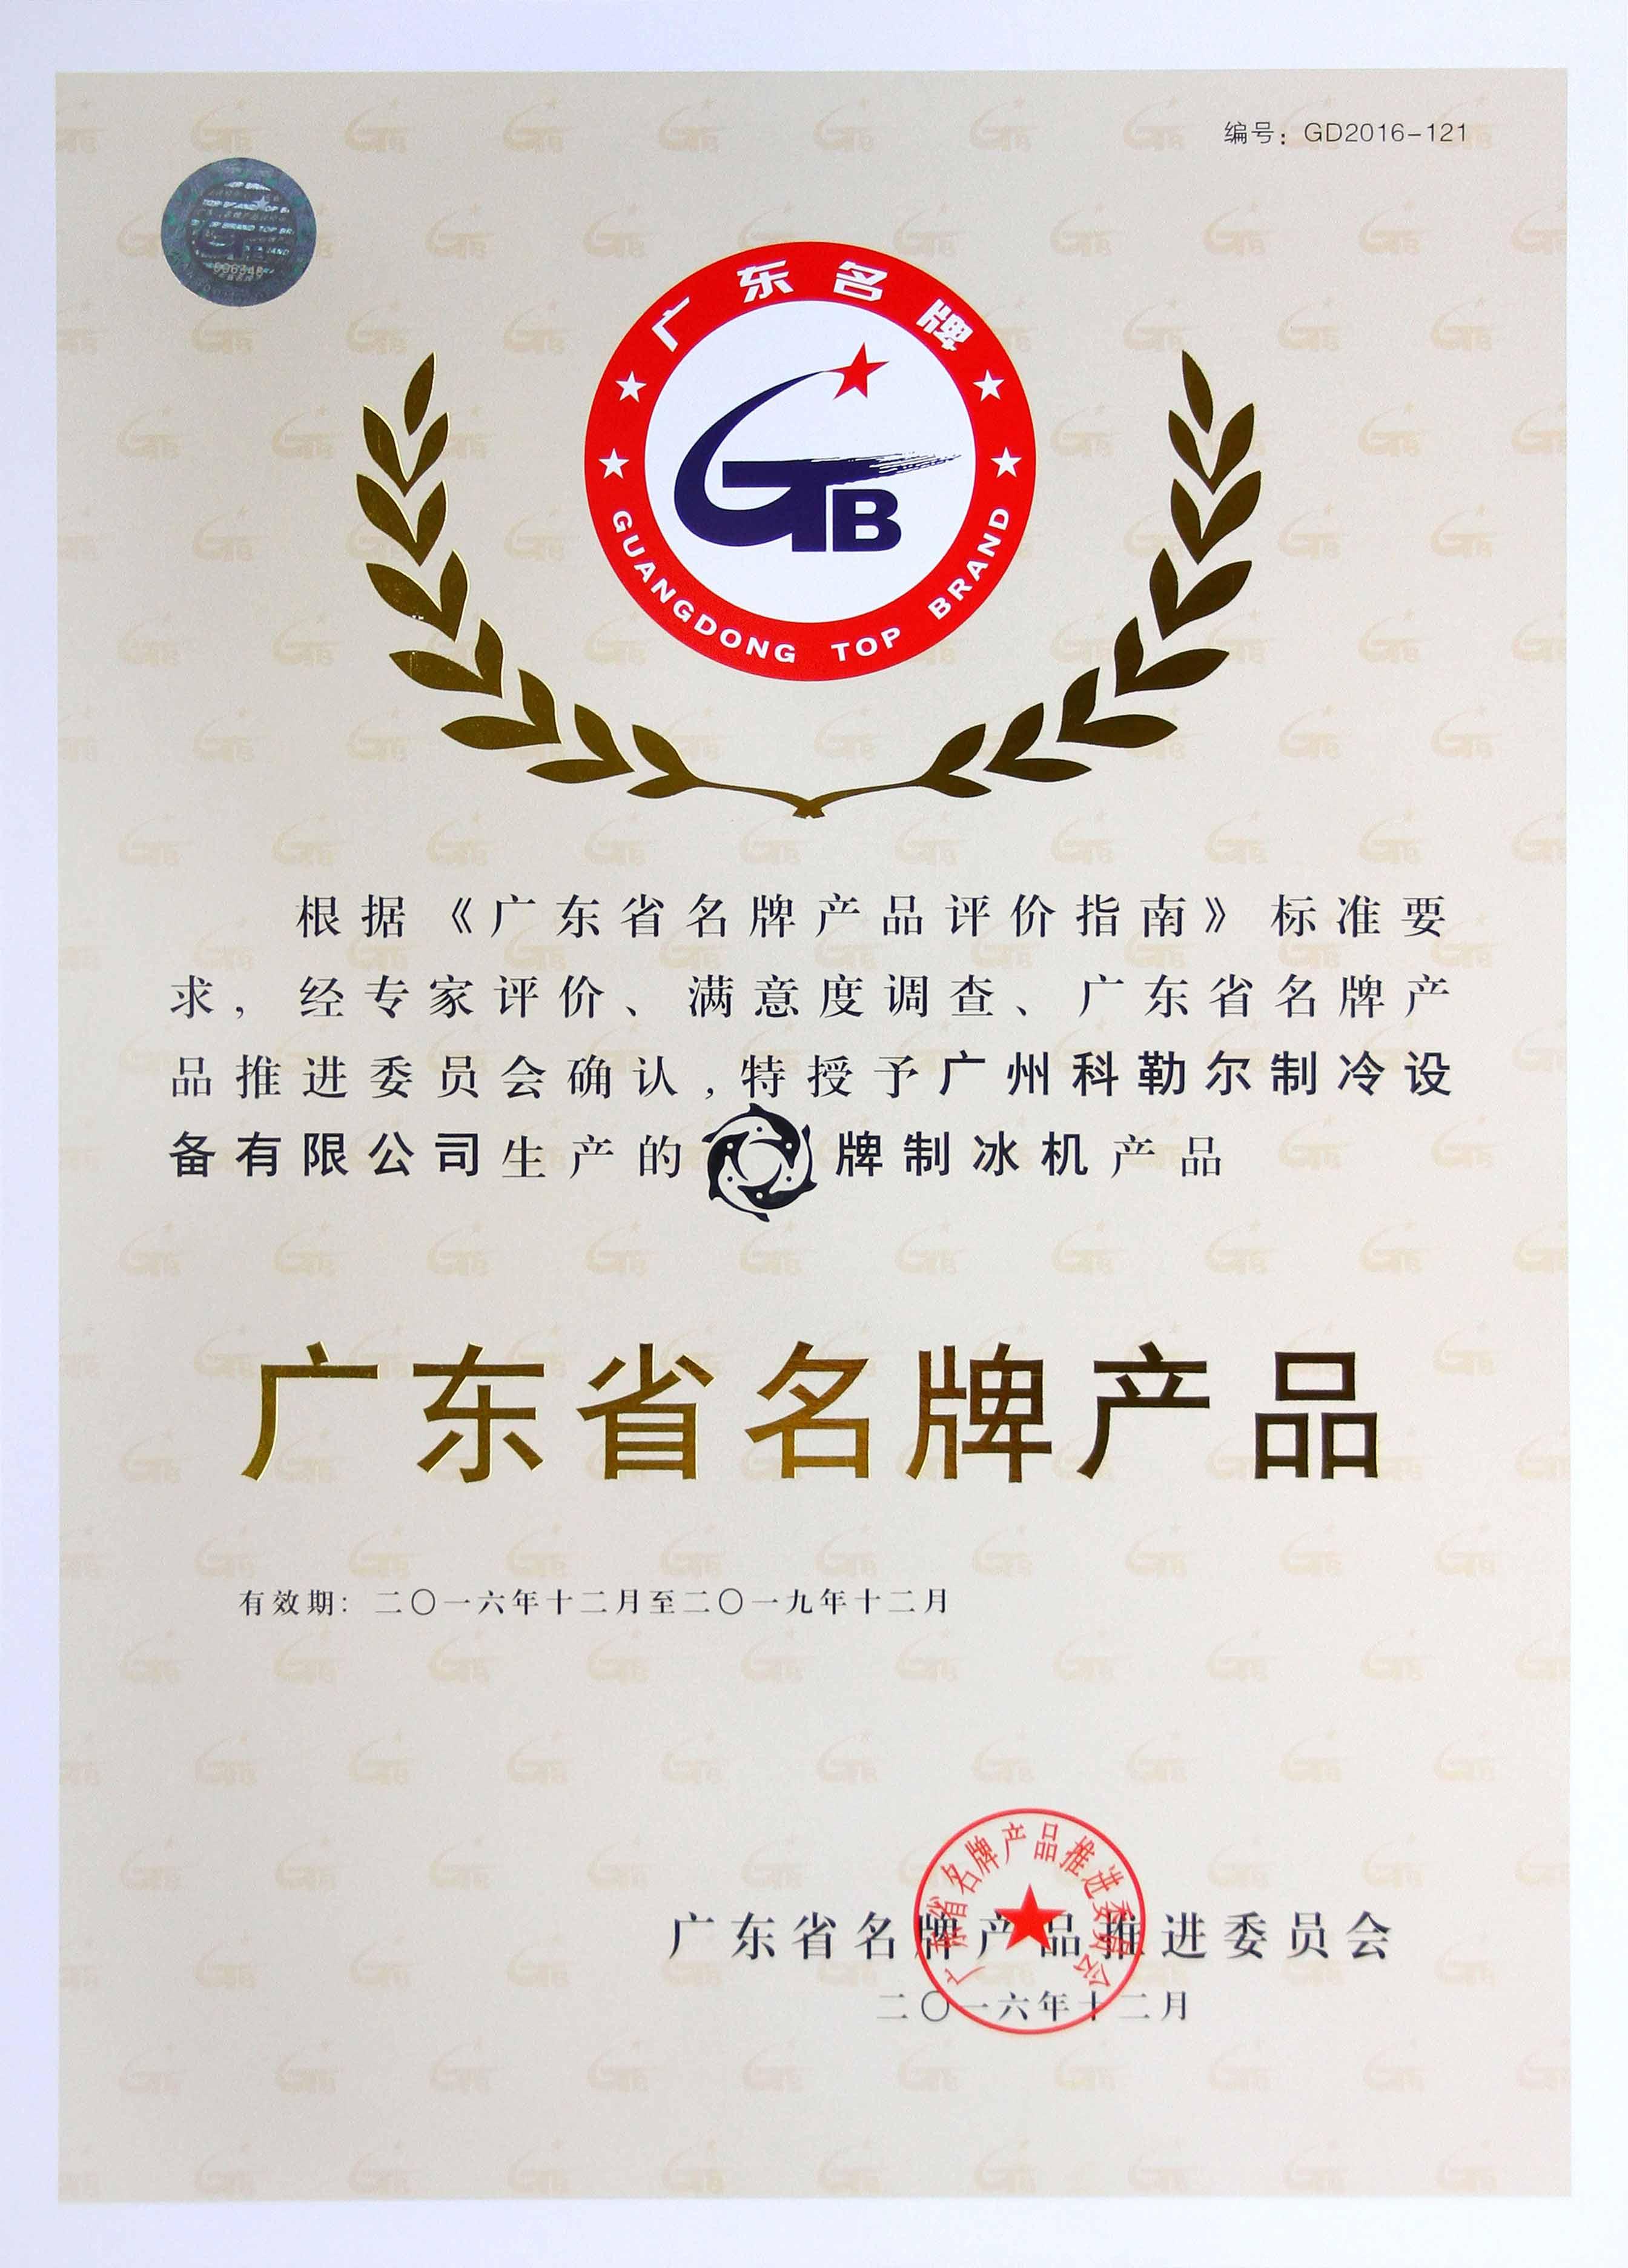 Certificate for famous brand enterprise